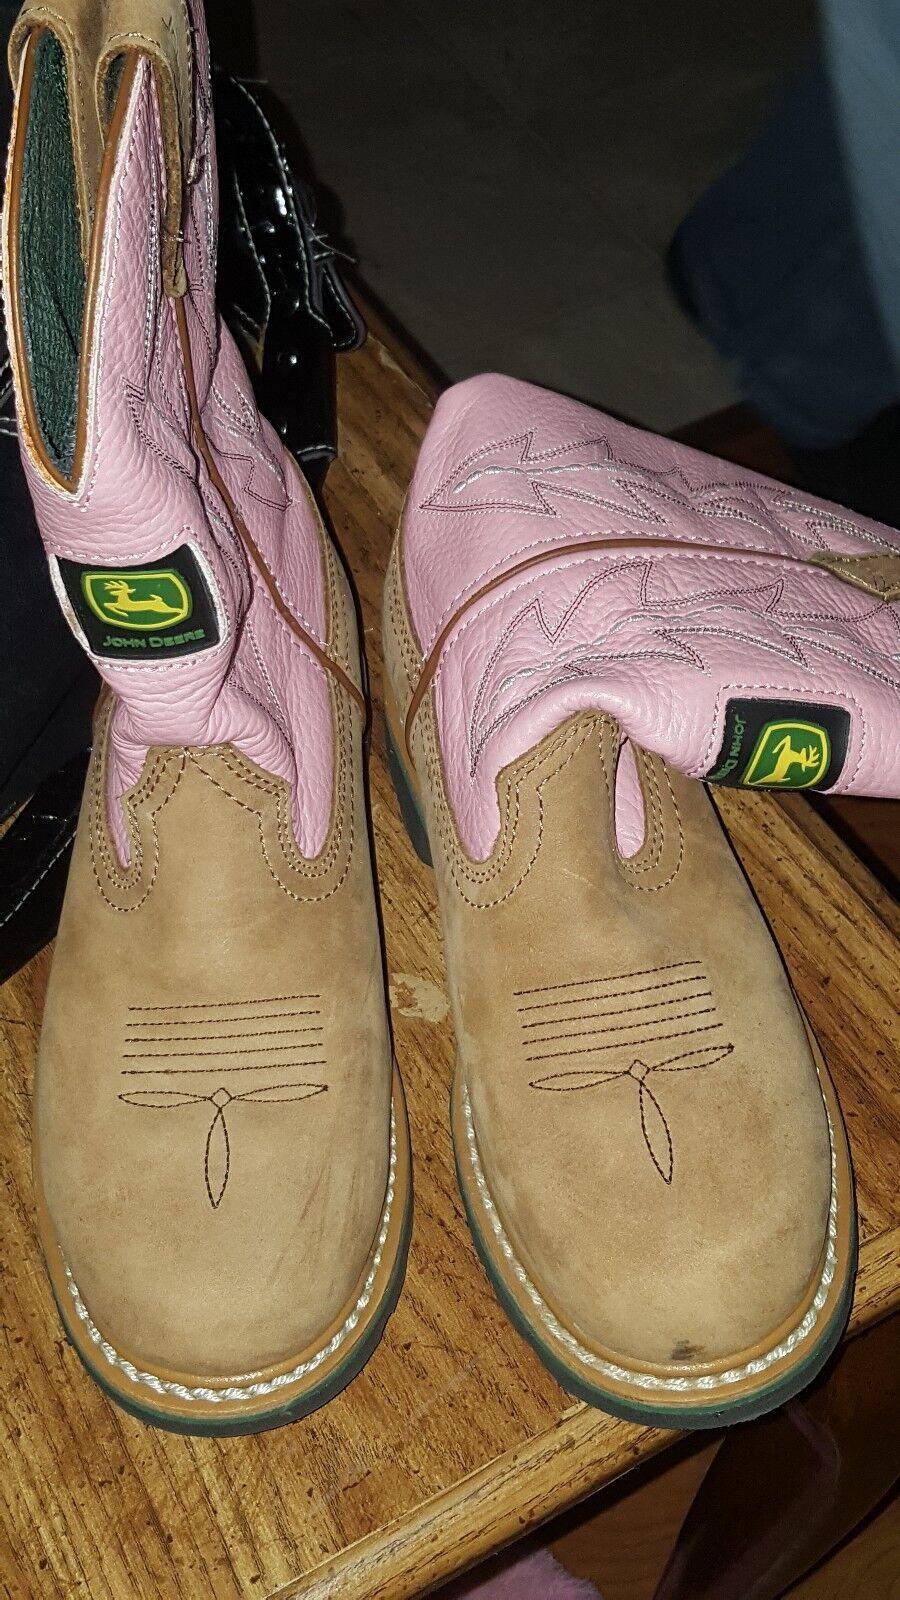 Pink john deere woman's boots size 6